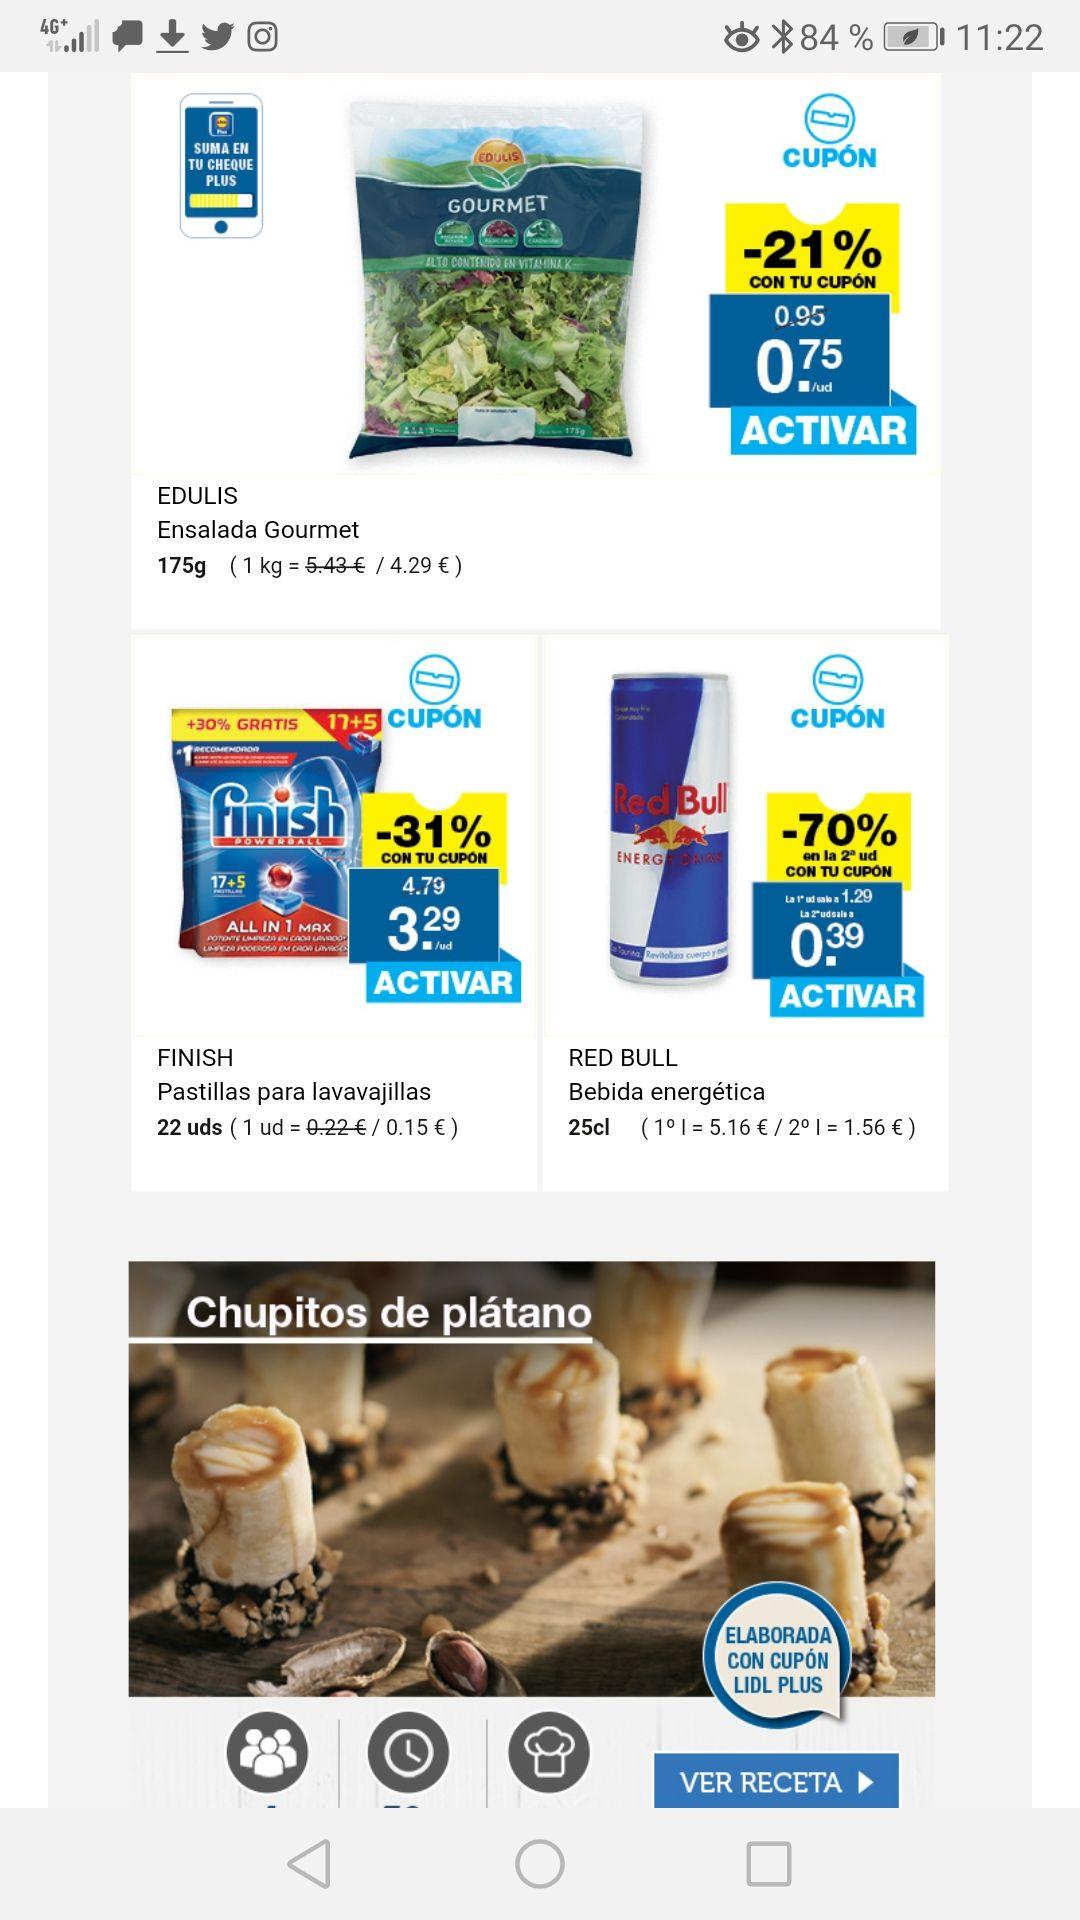 Oferta cupón app lidl